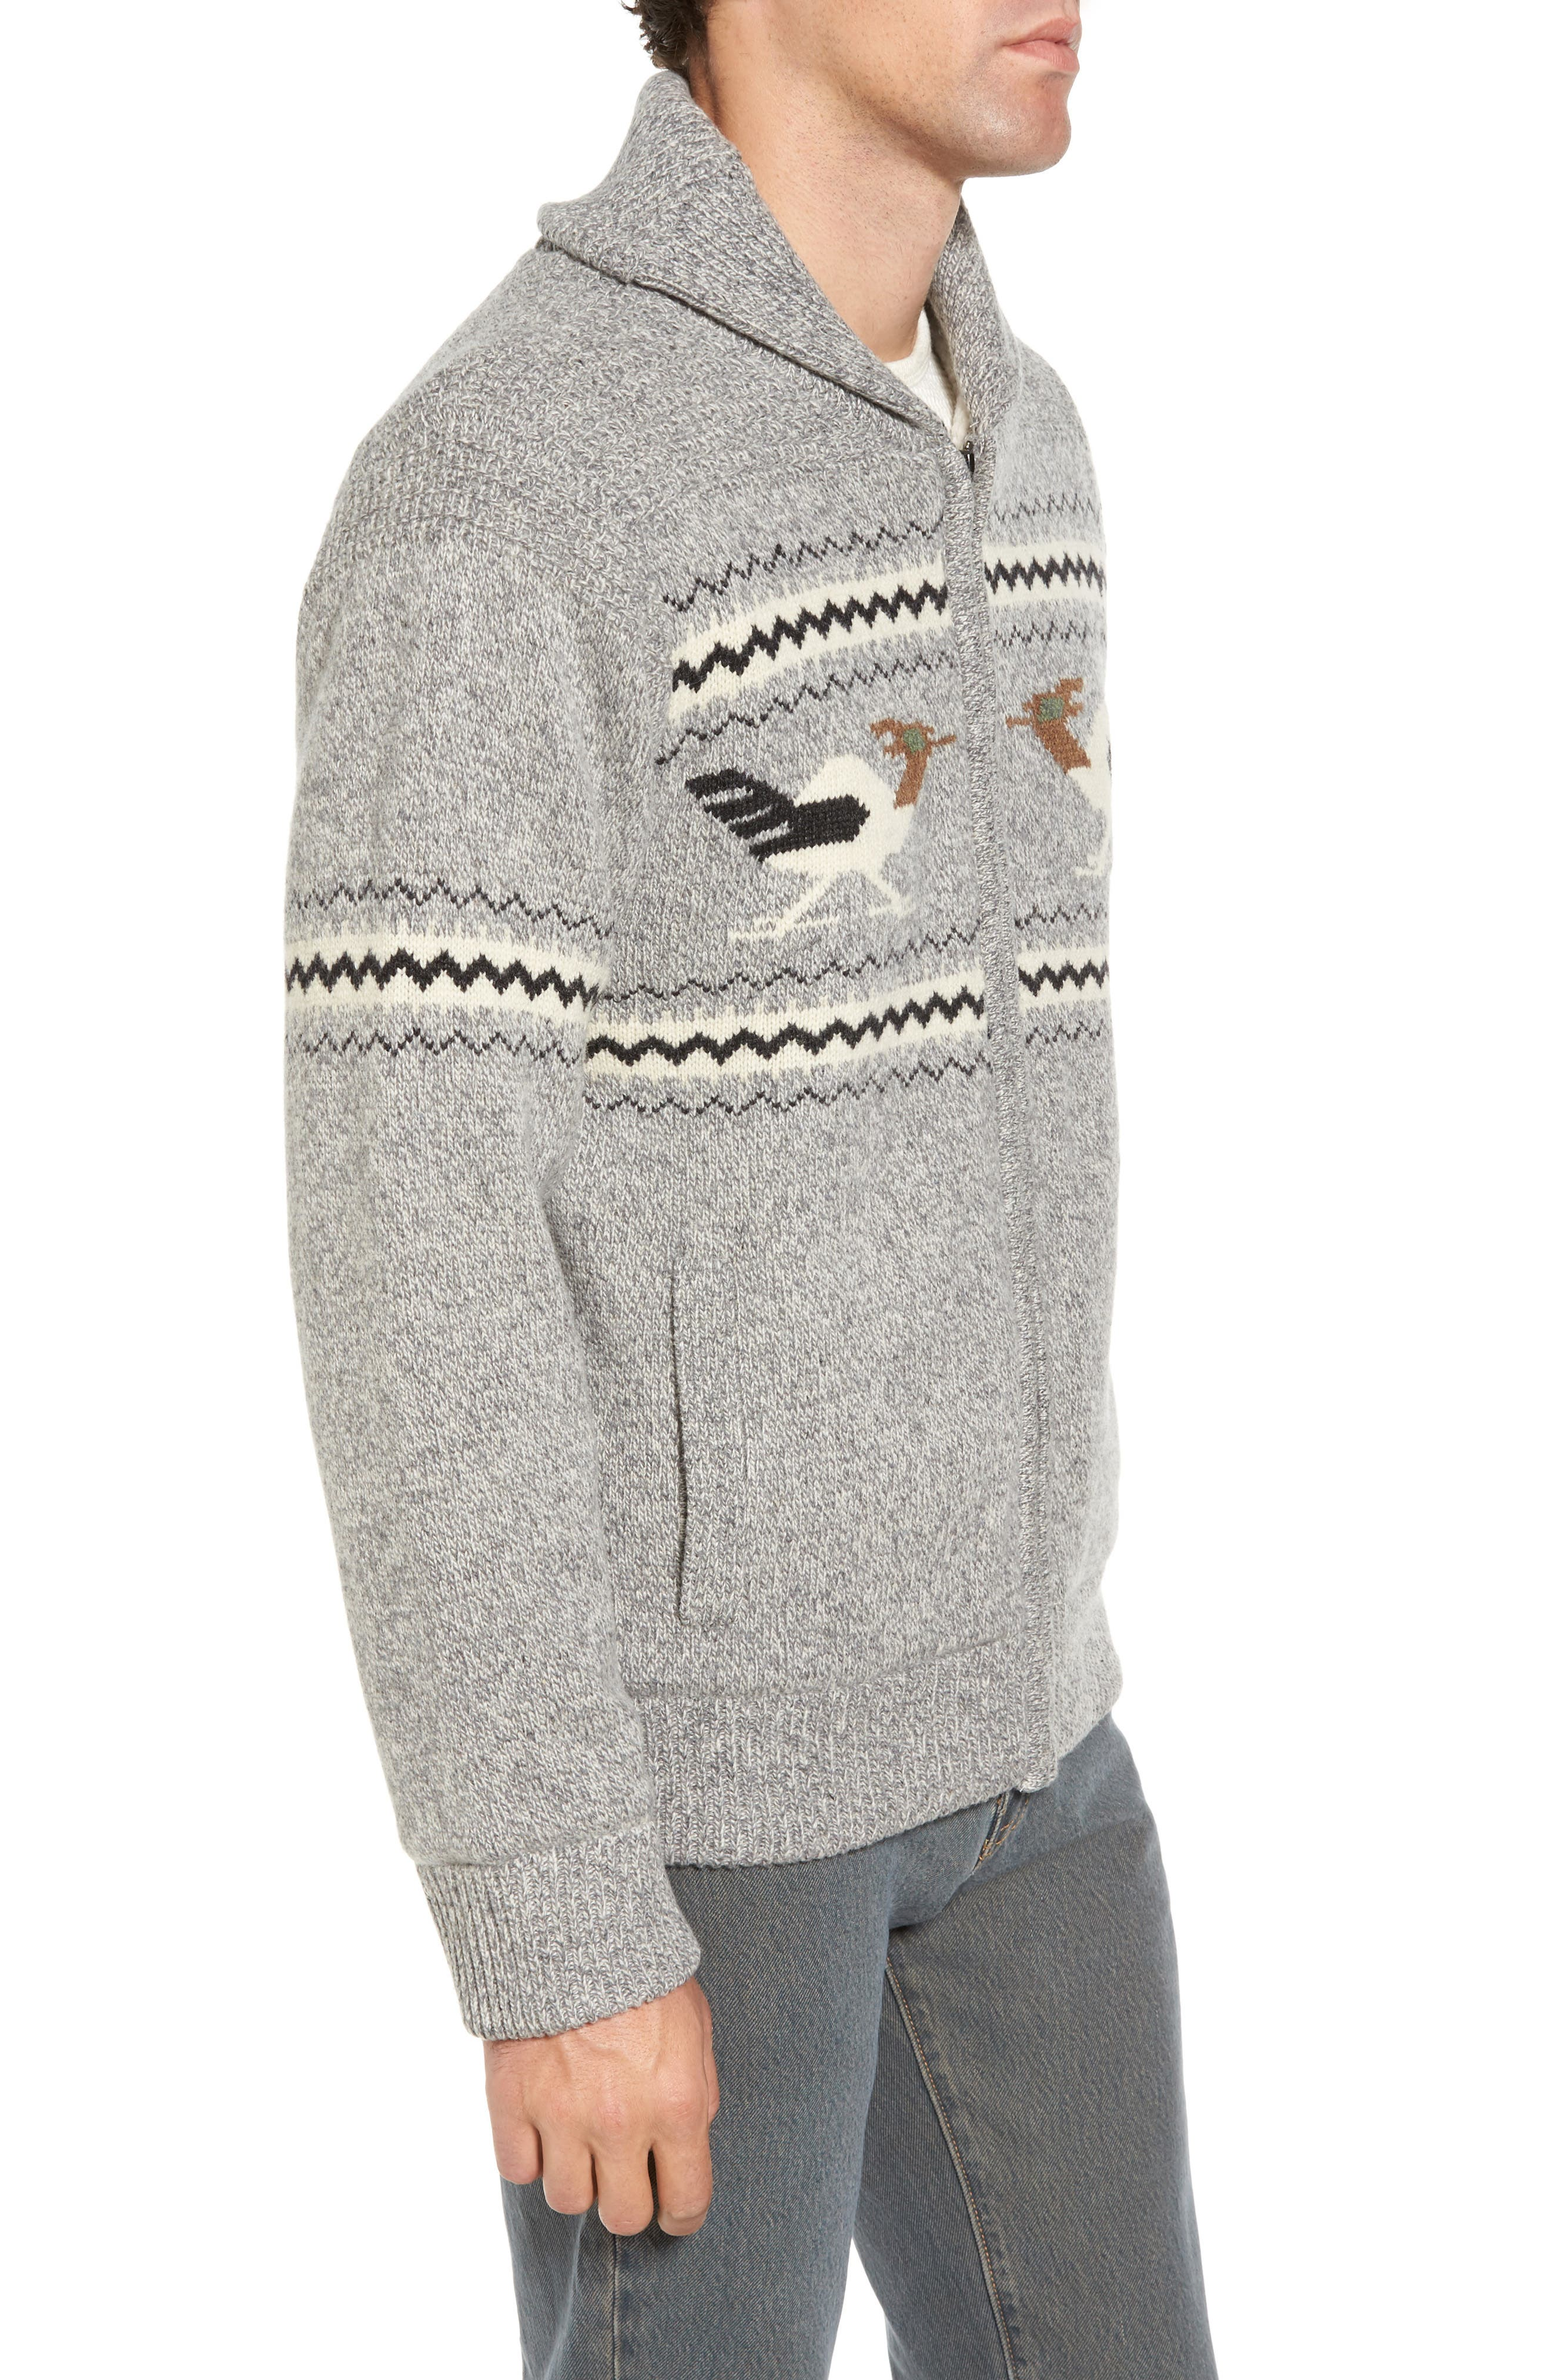 Road Runner Wool Blend Cardigan,                             Alternate thumbnail 3, color,                             050